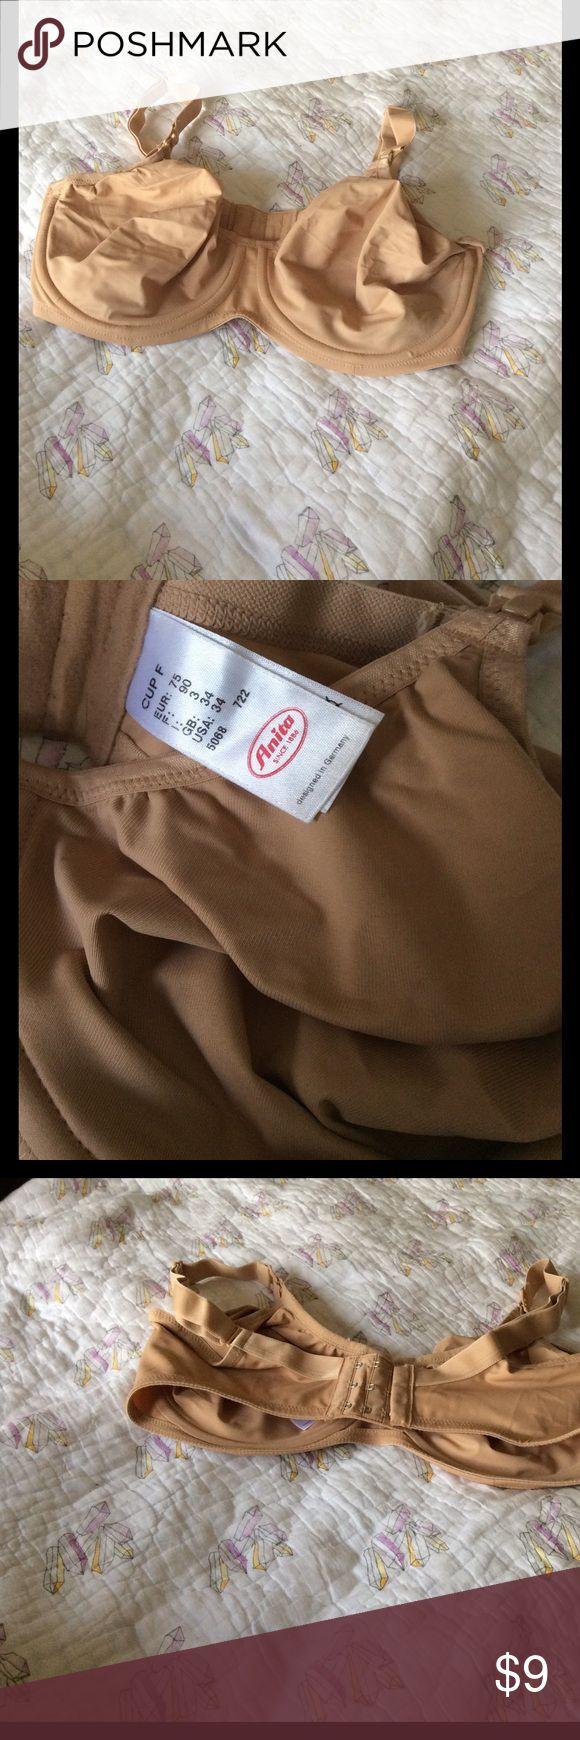 Anita 34F Nursing Bra Never worn nursing bra, size 34F Anita Intimates & Sleepwear Bras